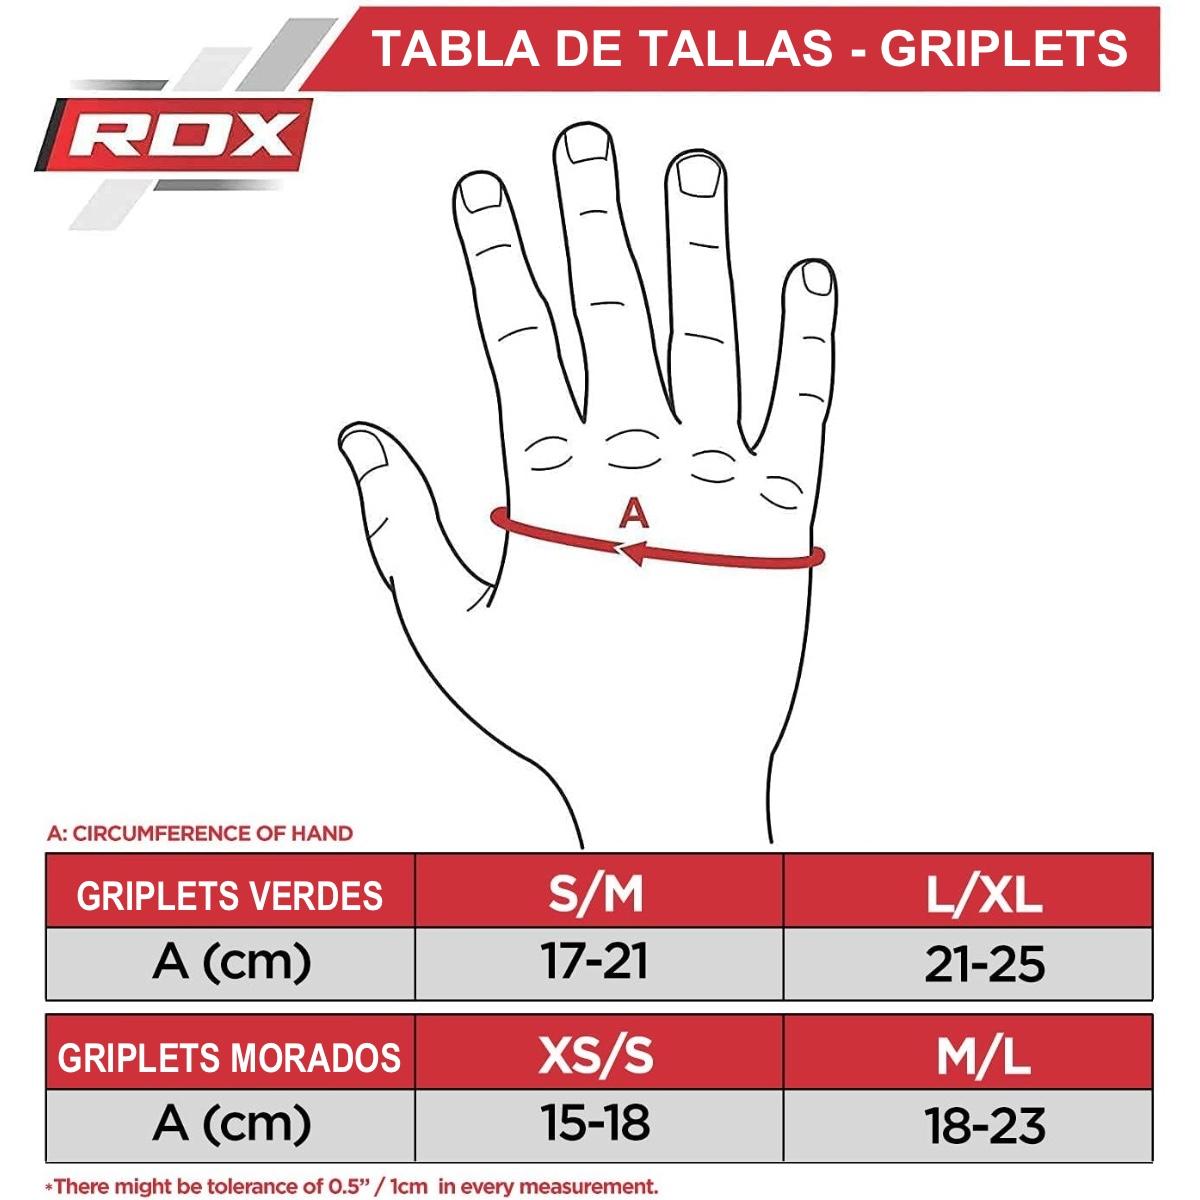 Tabla de tallas - Griplets Rdx